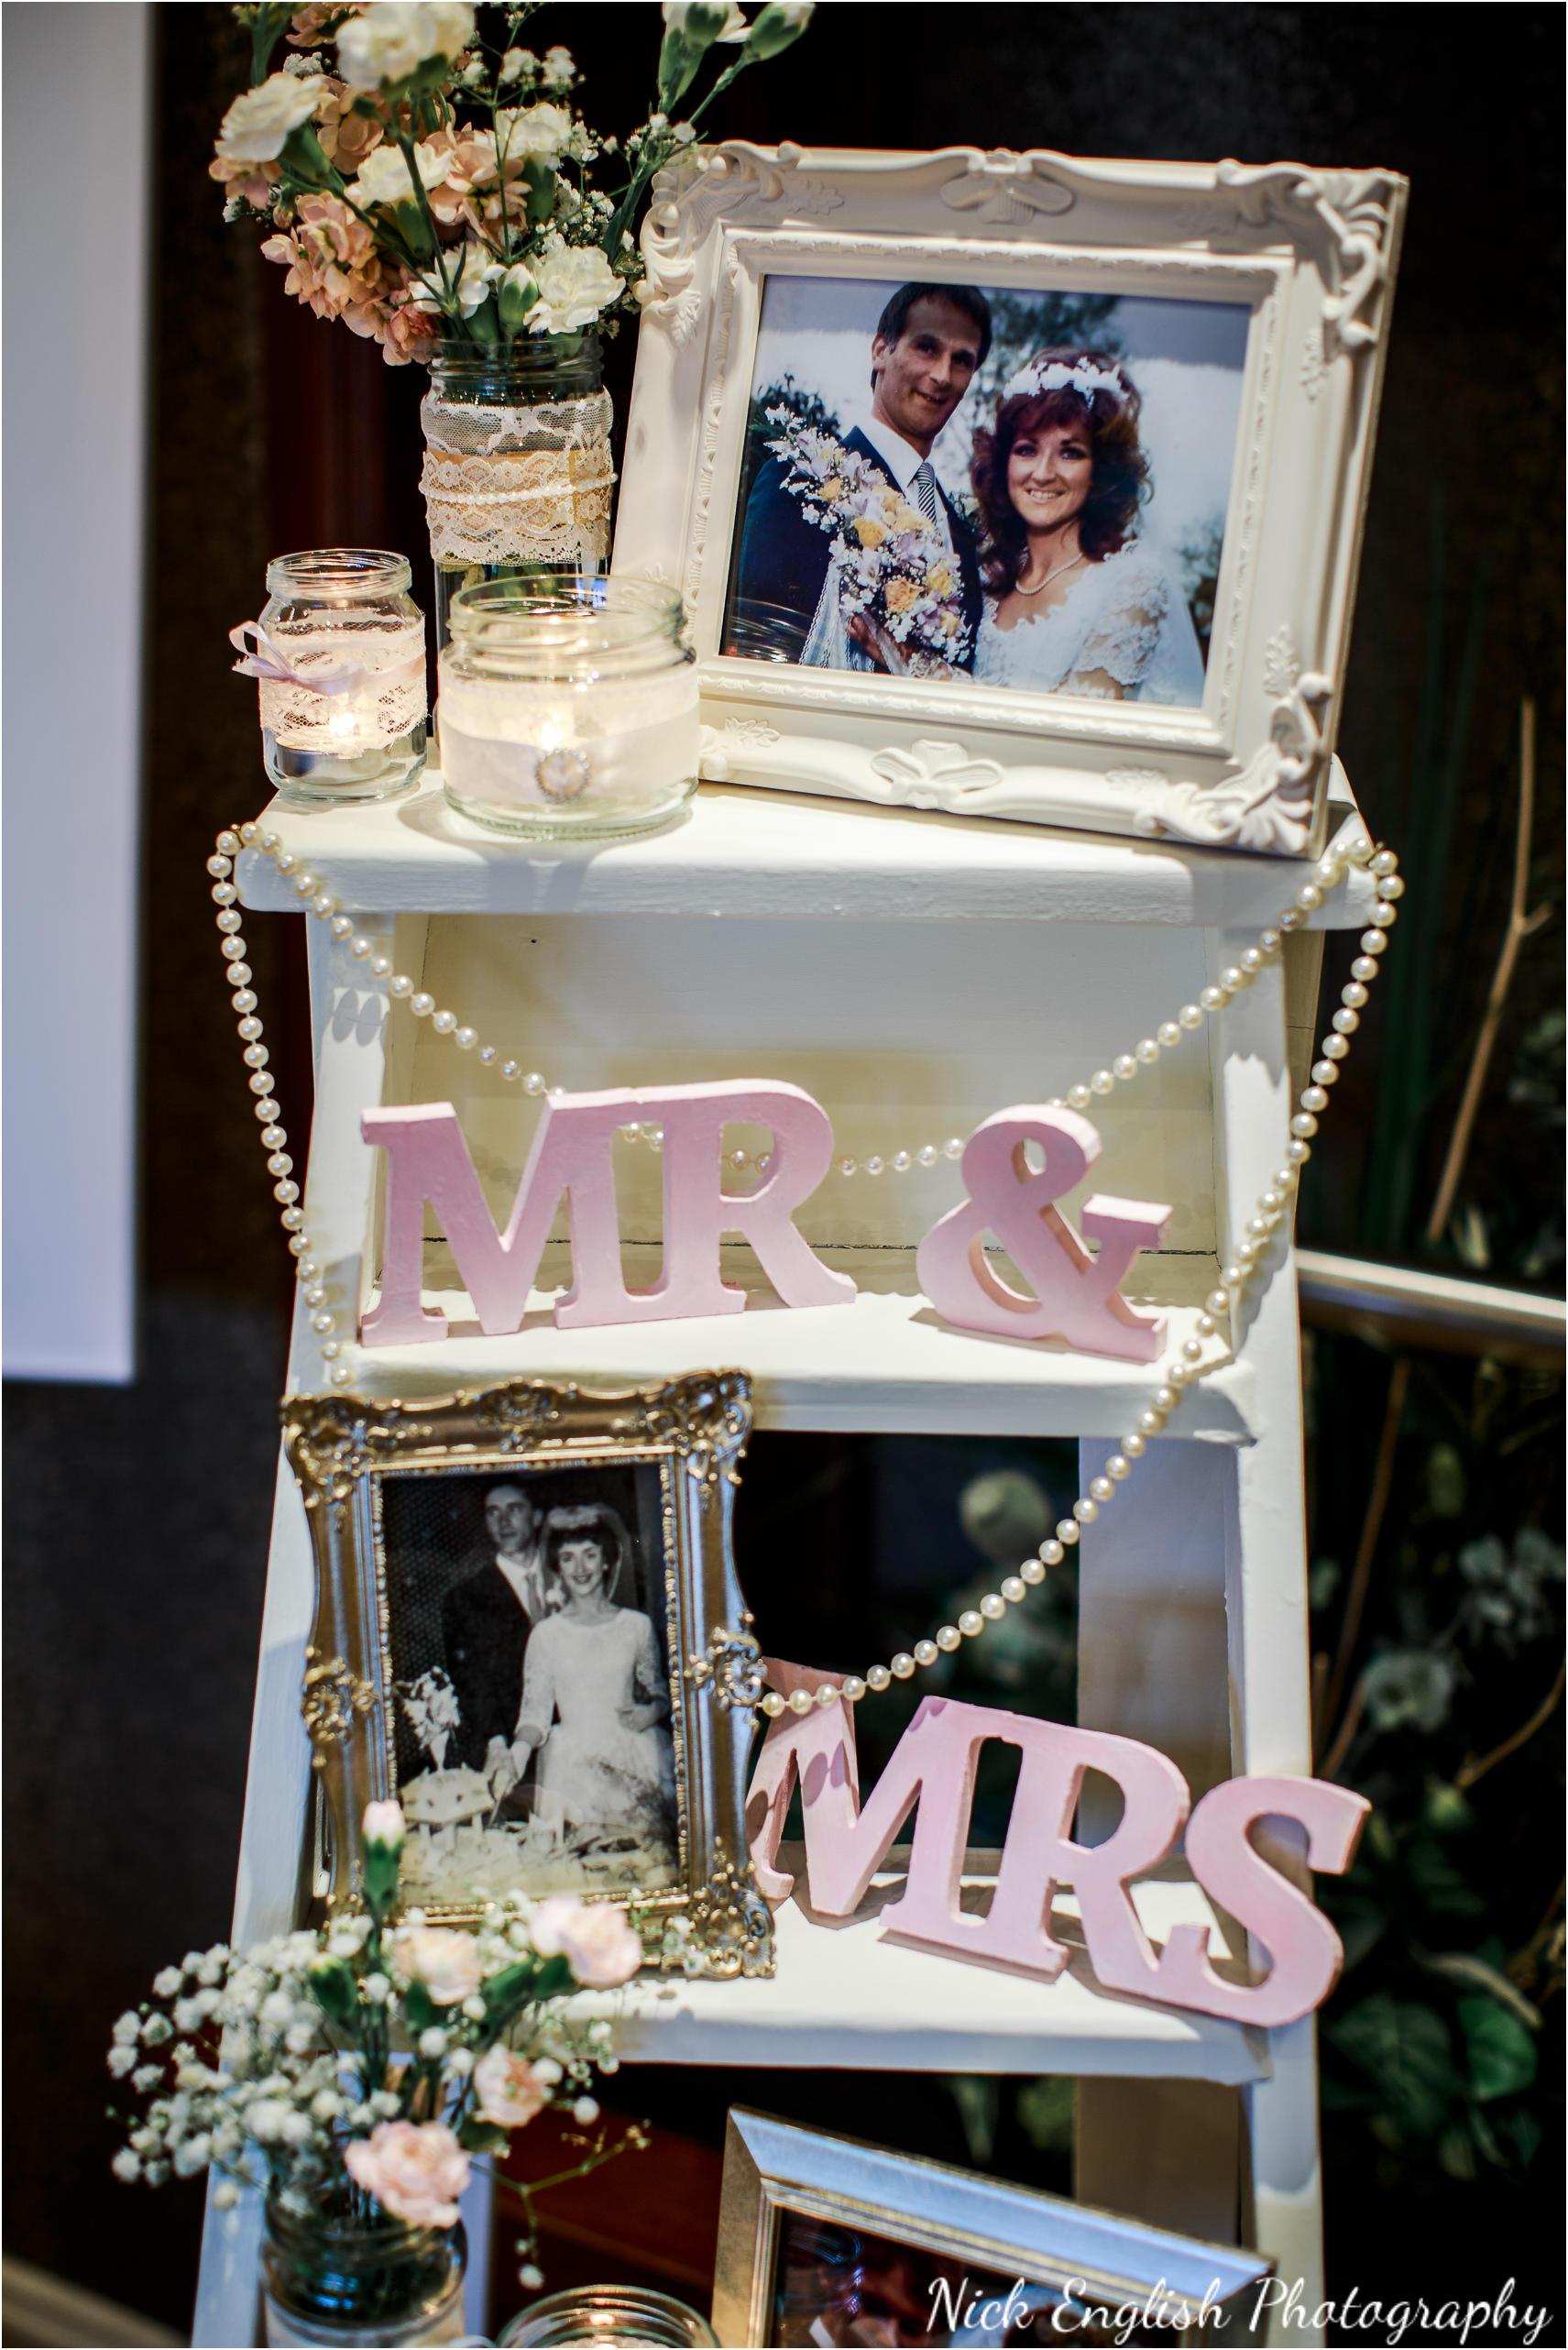 Emily David Wedding Photographs at Barton Grange Preston by Nick English Photography 45jpg.jpeg